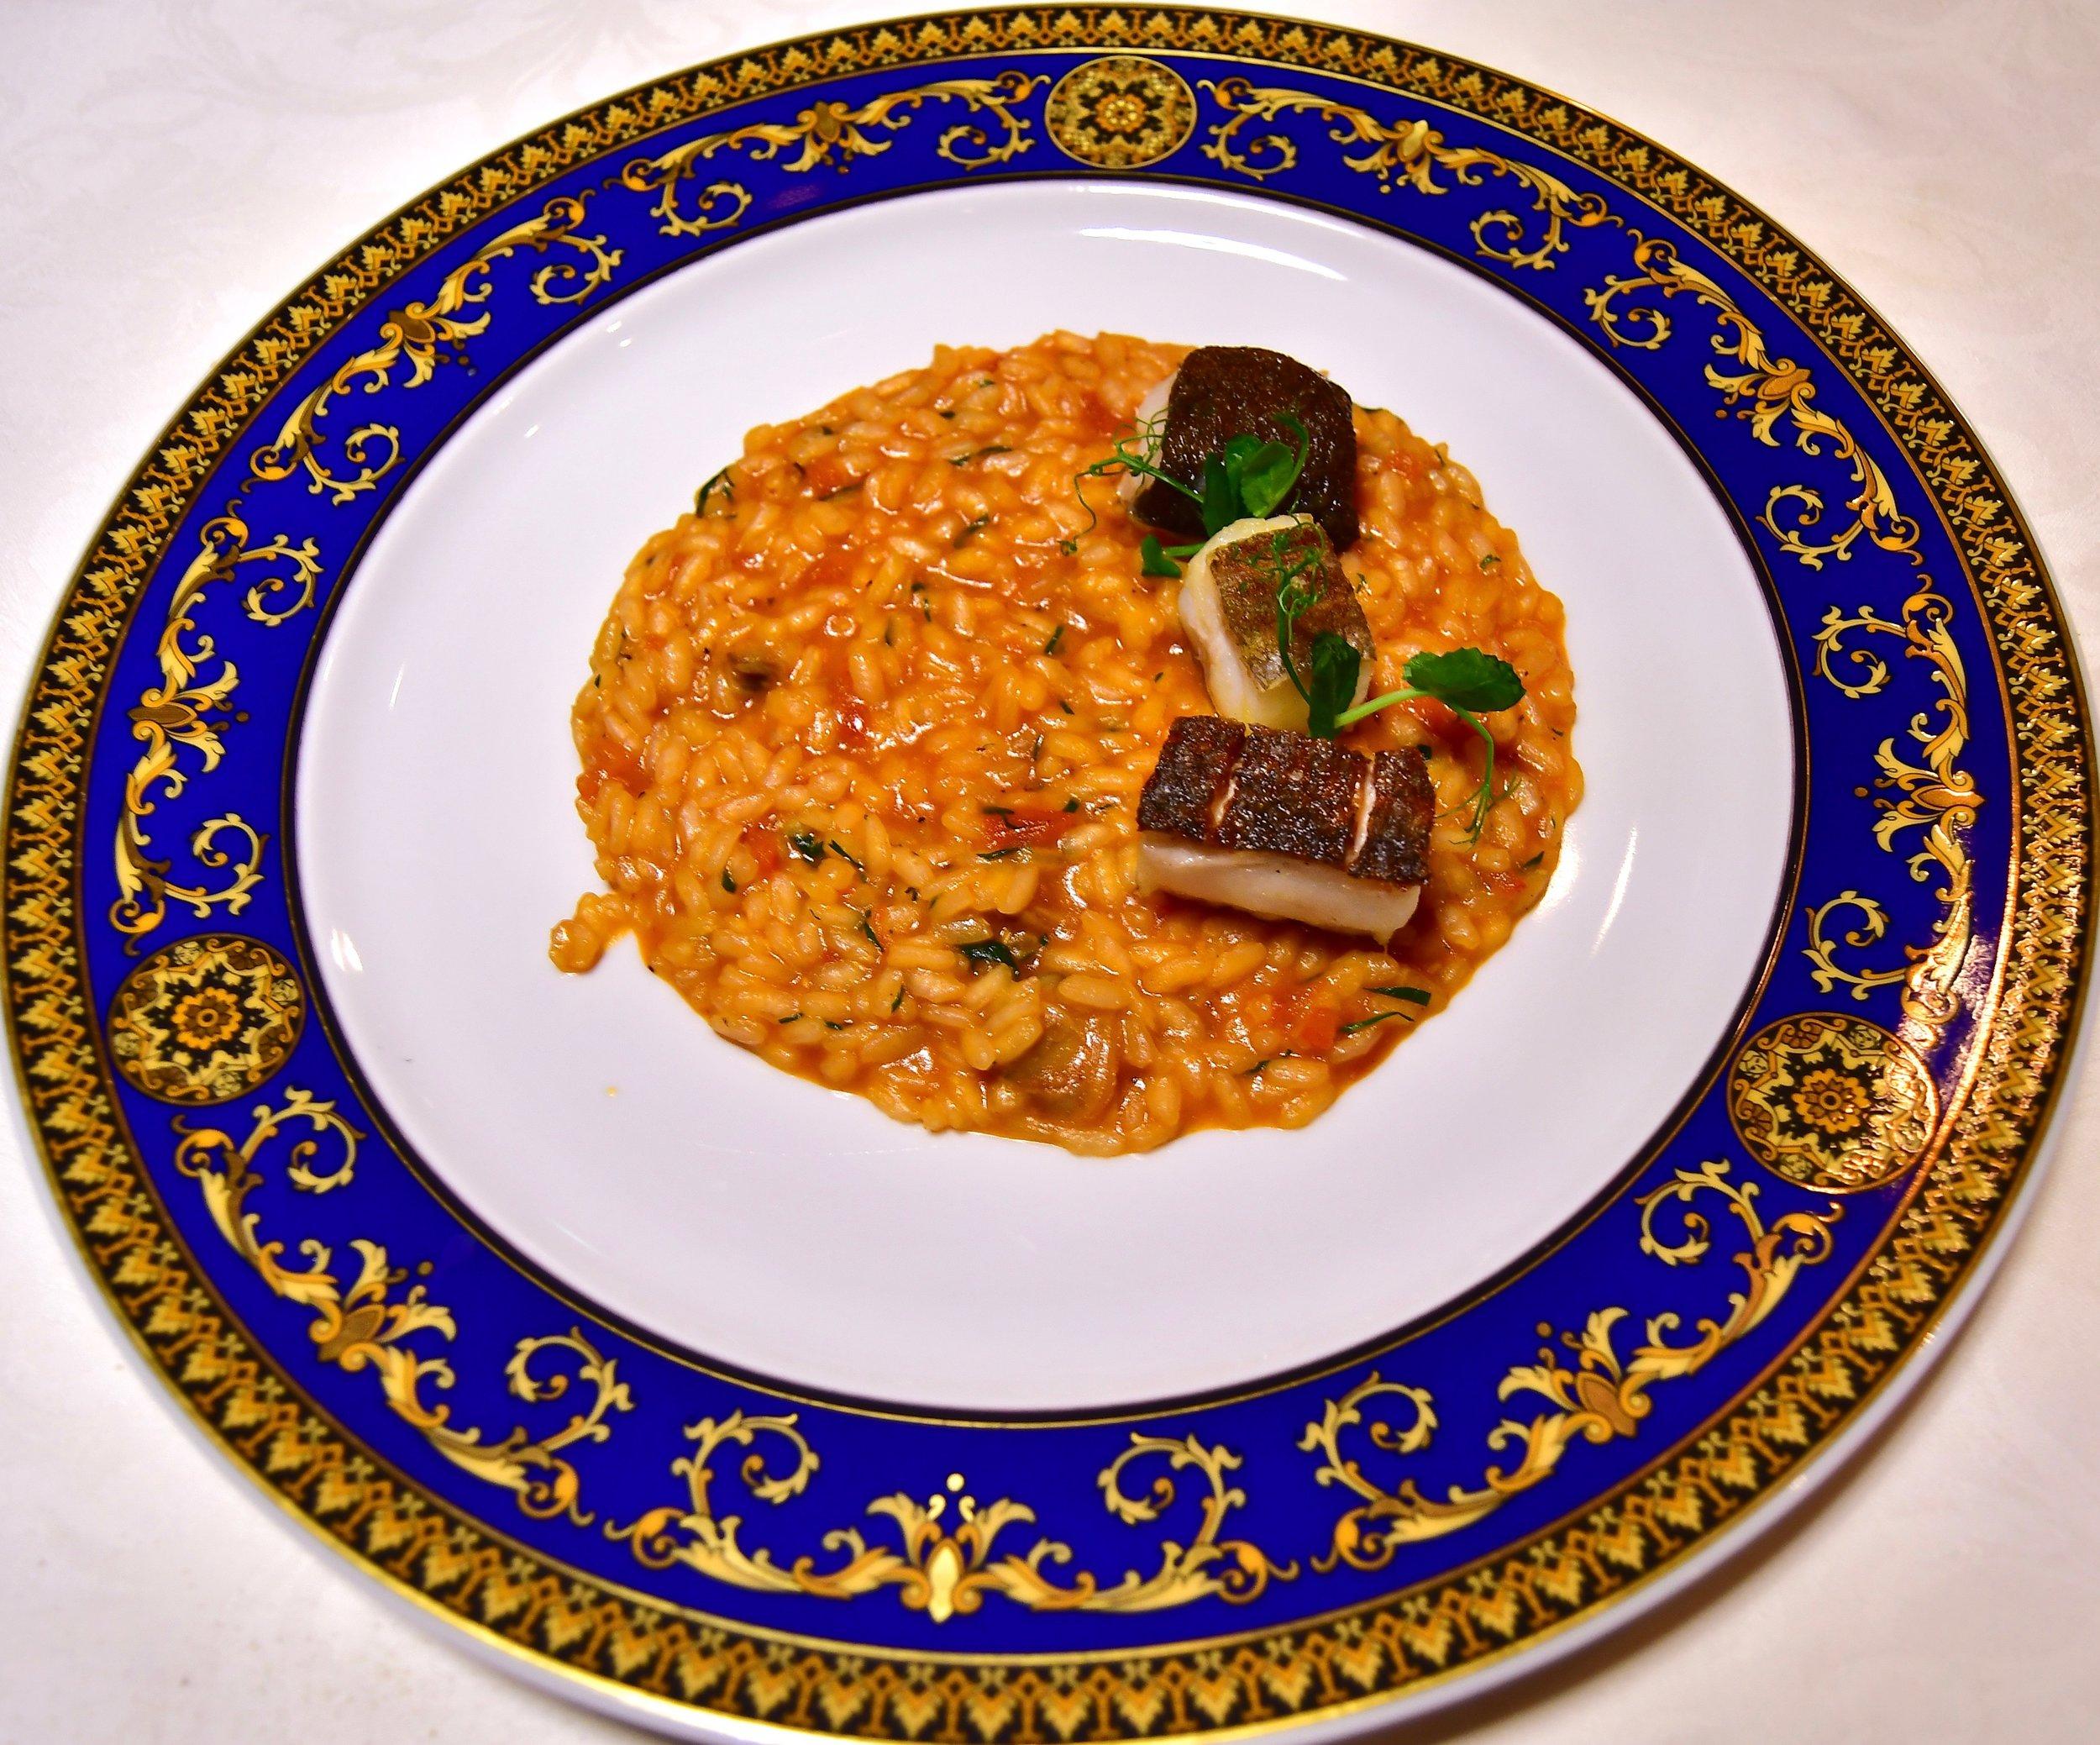 Vanitas - Seafood Risotto (Palazzo Versace Dubai)